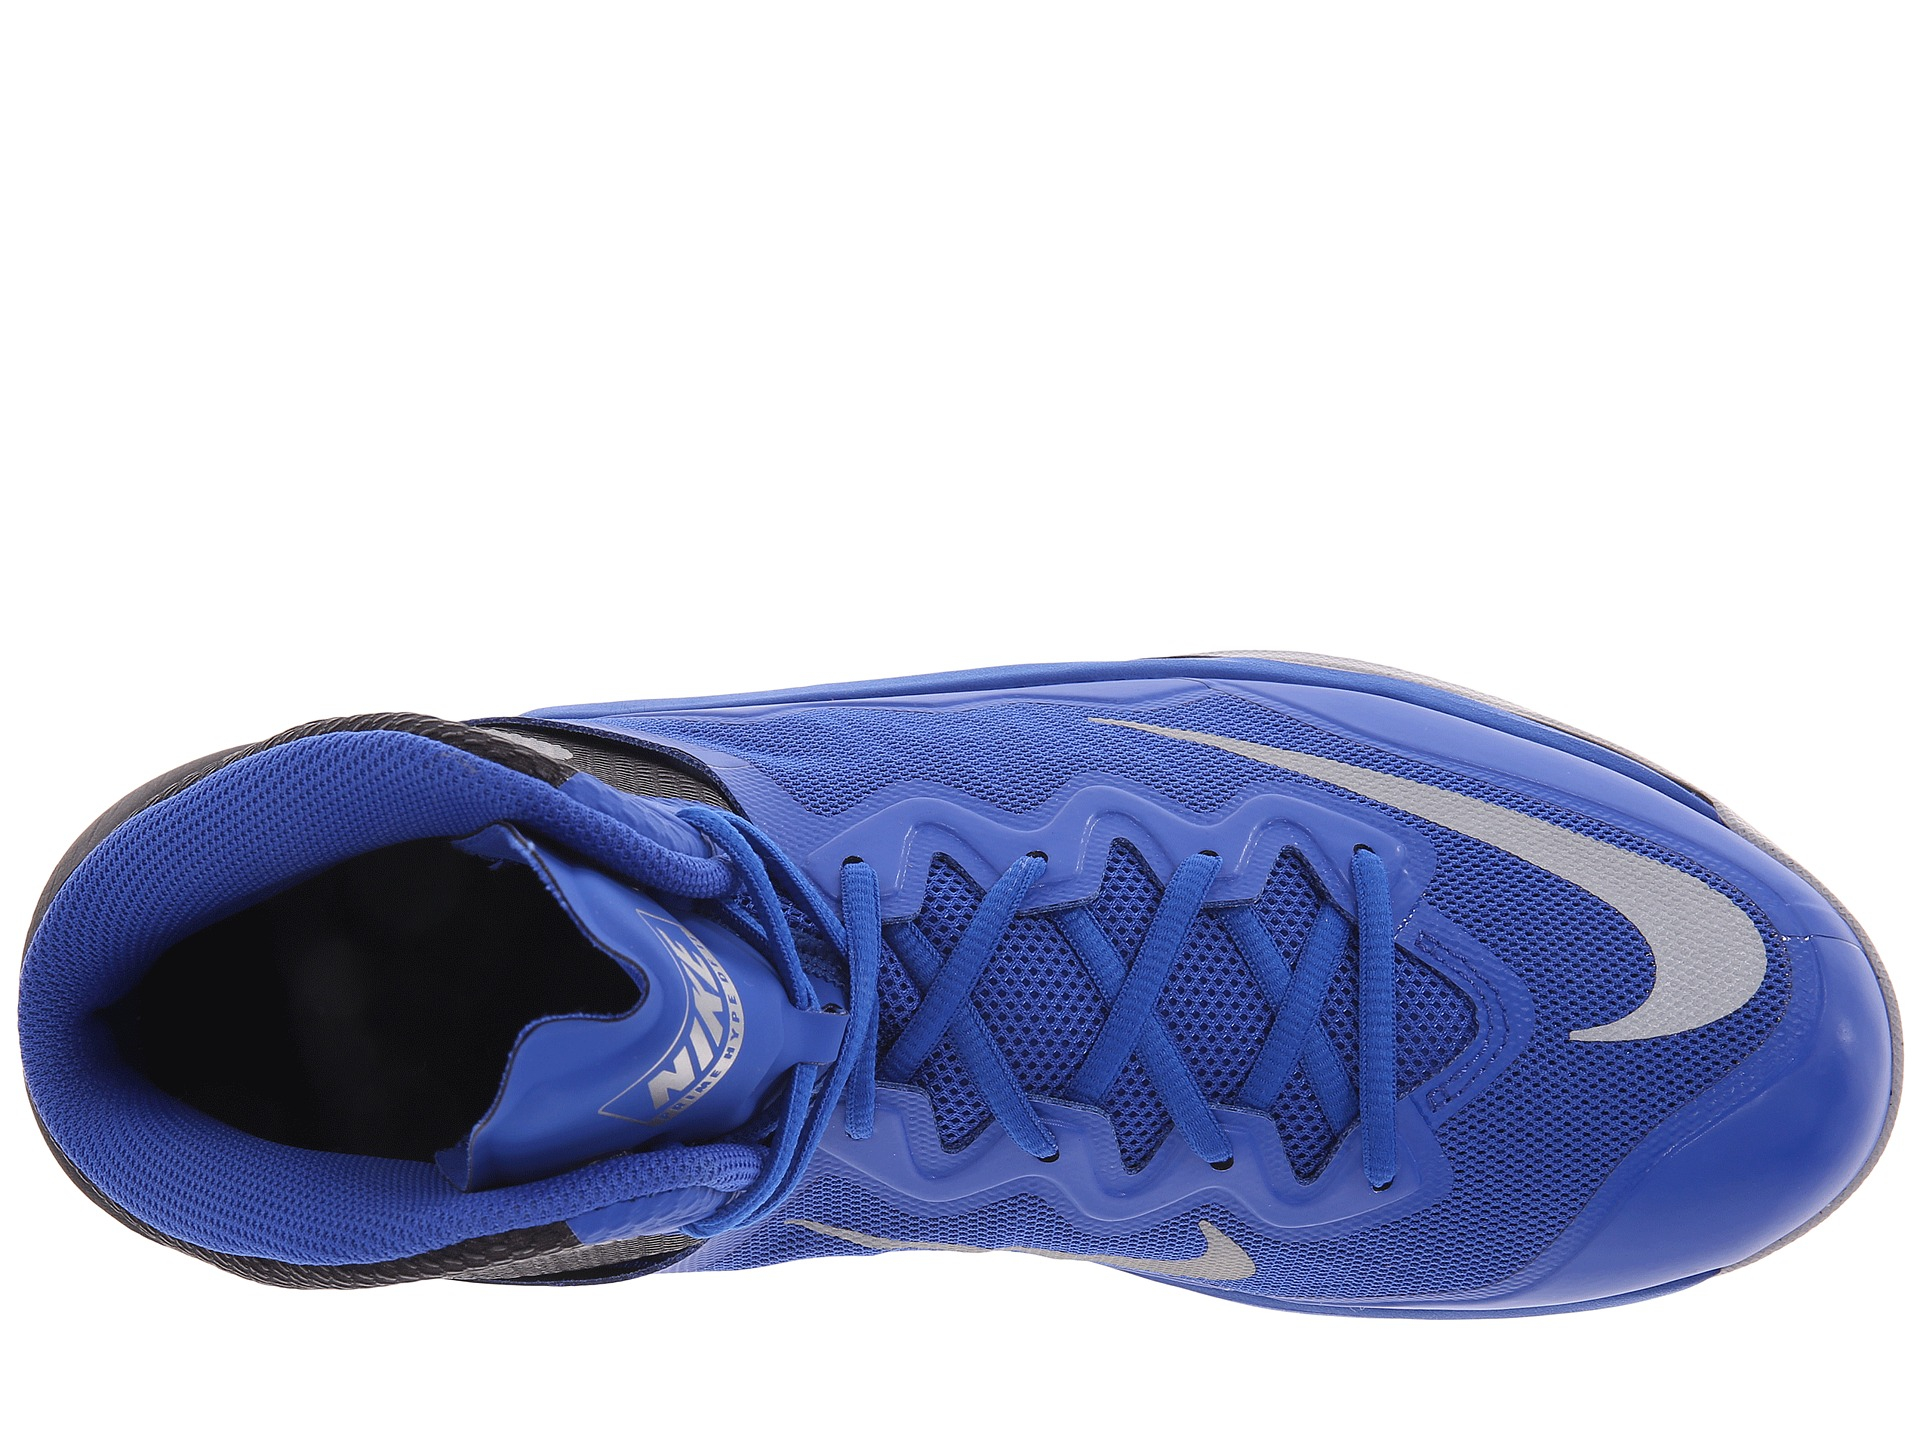 new product c8eb4 13e00 Men's Blue Prime Hype Df Ii